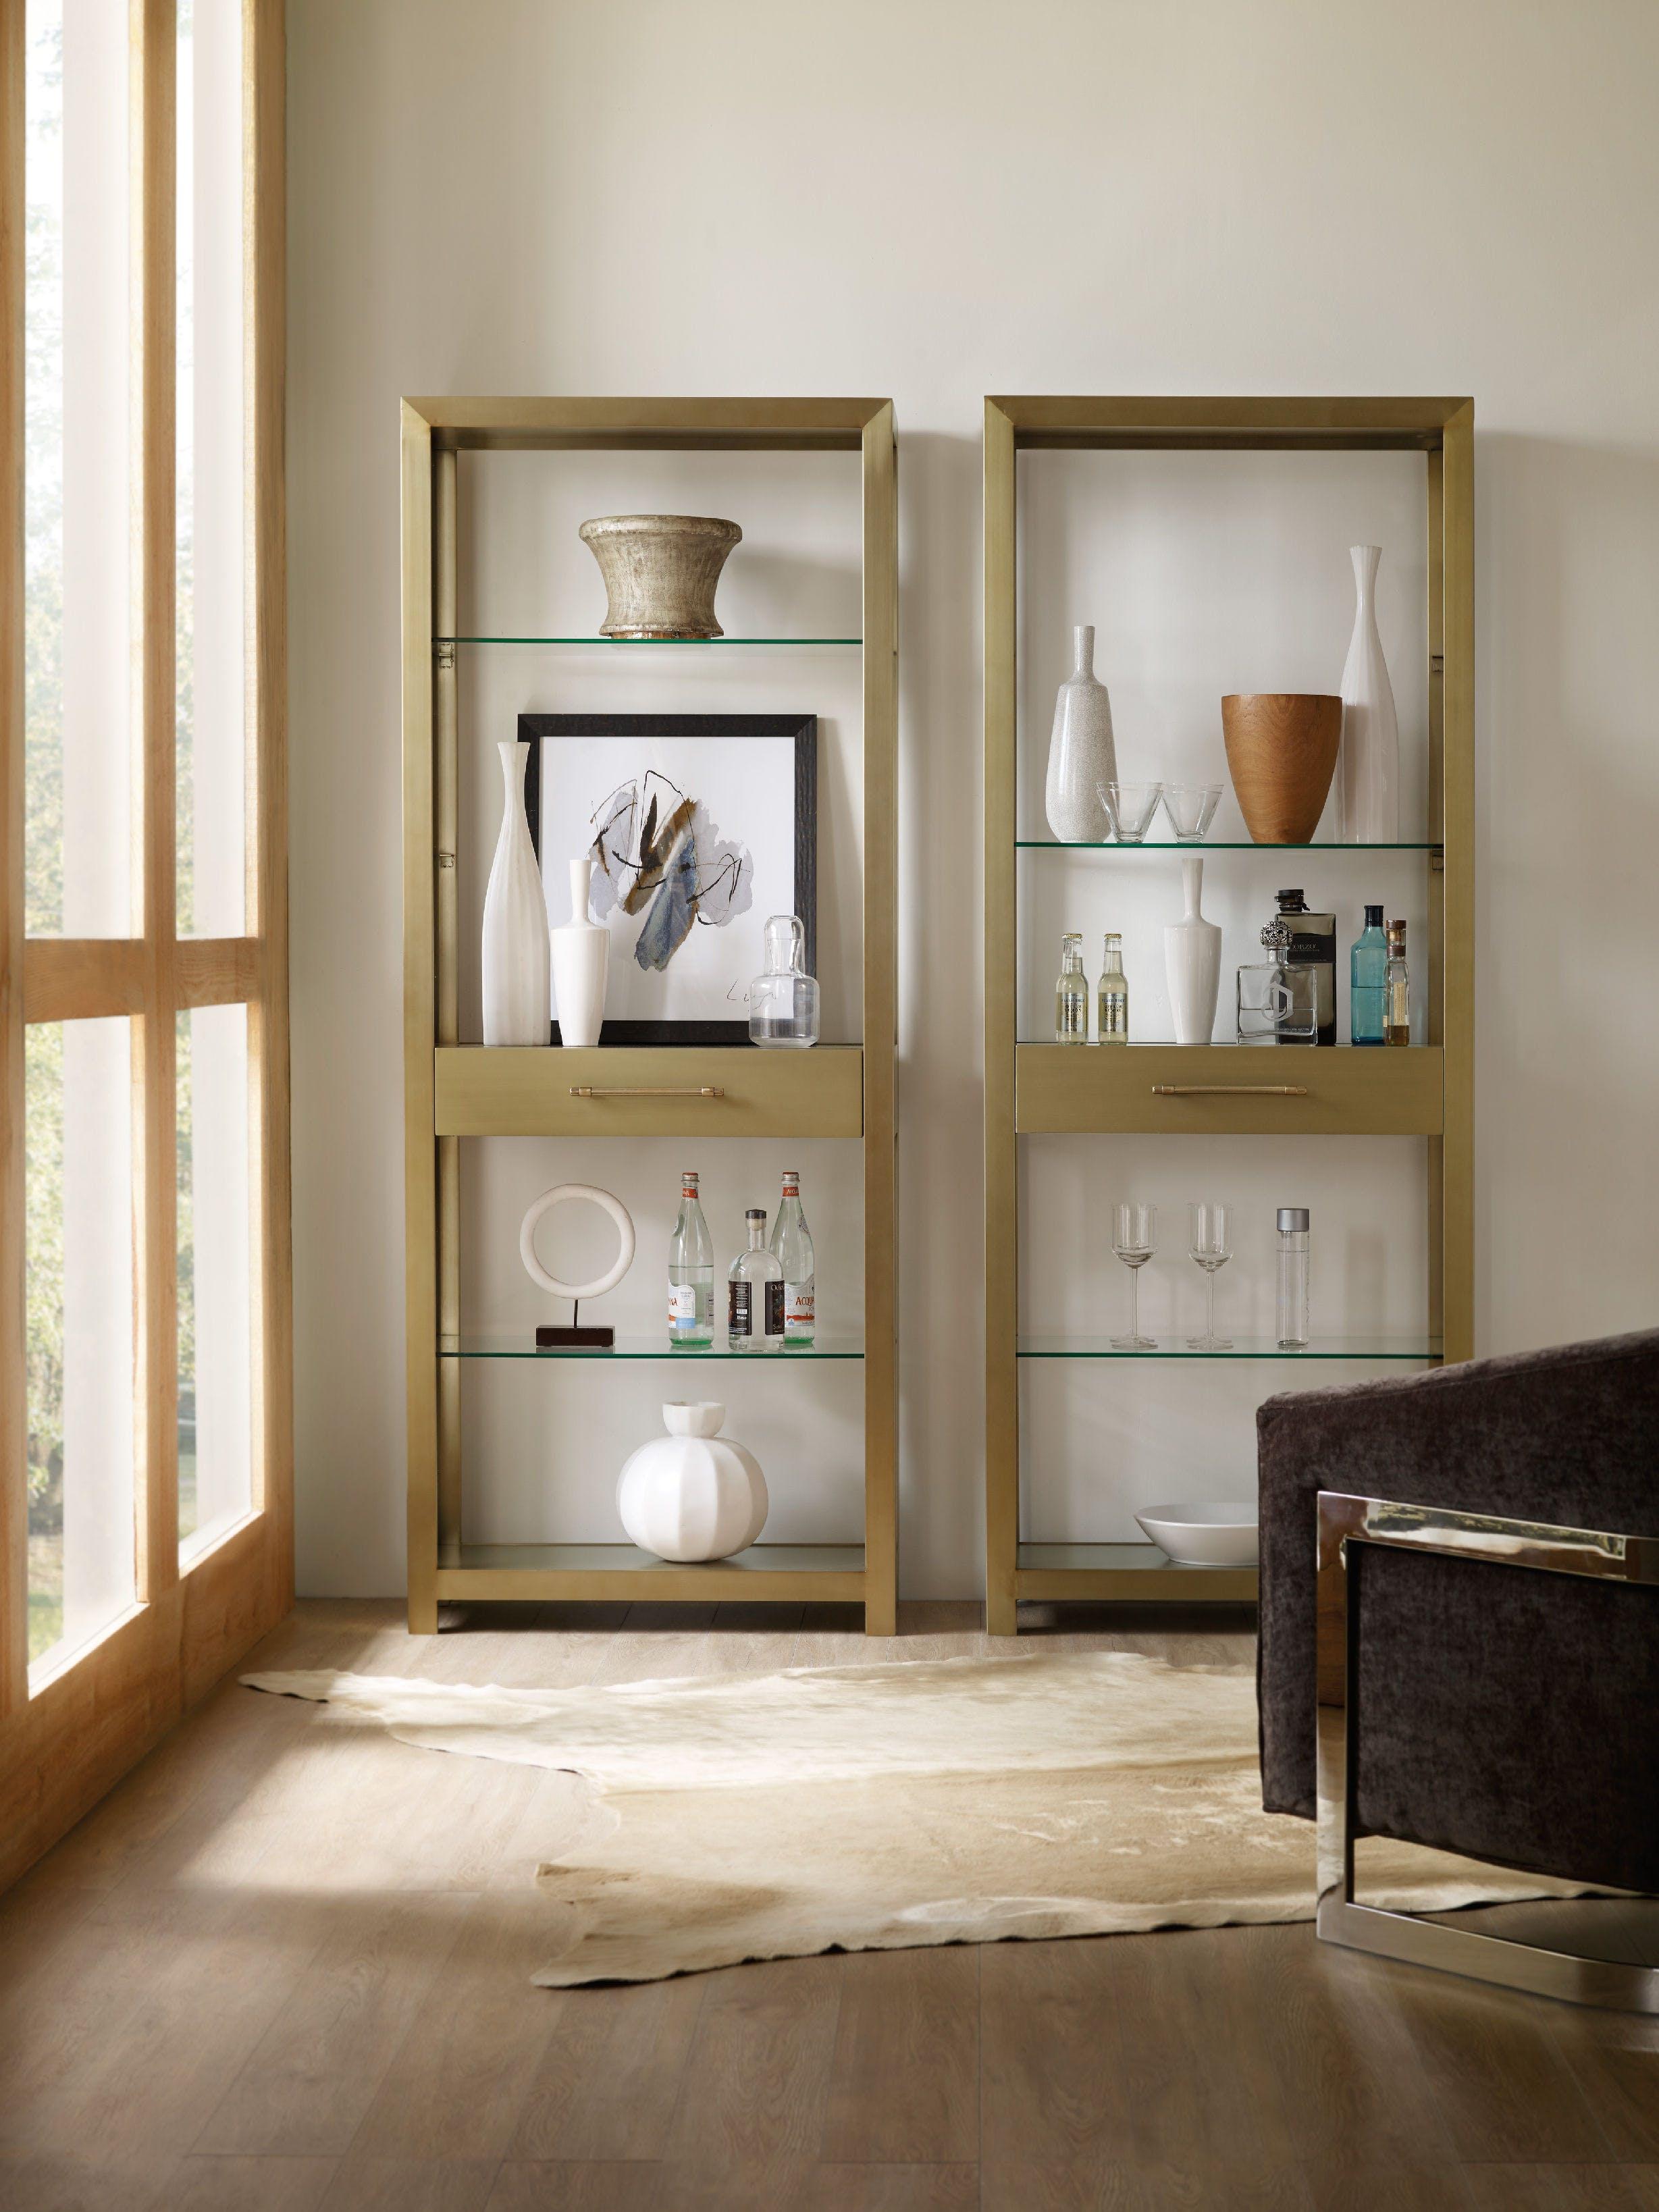 Matthews Interiors - Office Furniture - Hooker 1600-10445-mtl1-room.jpg